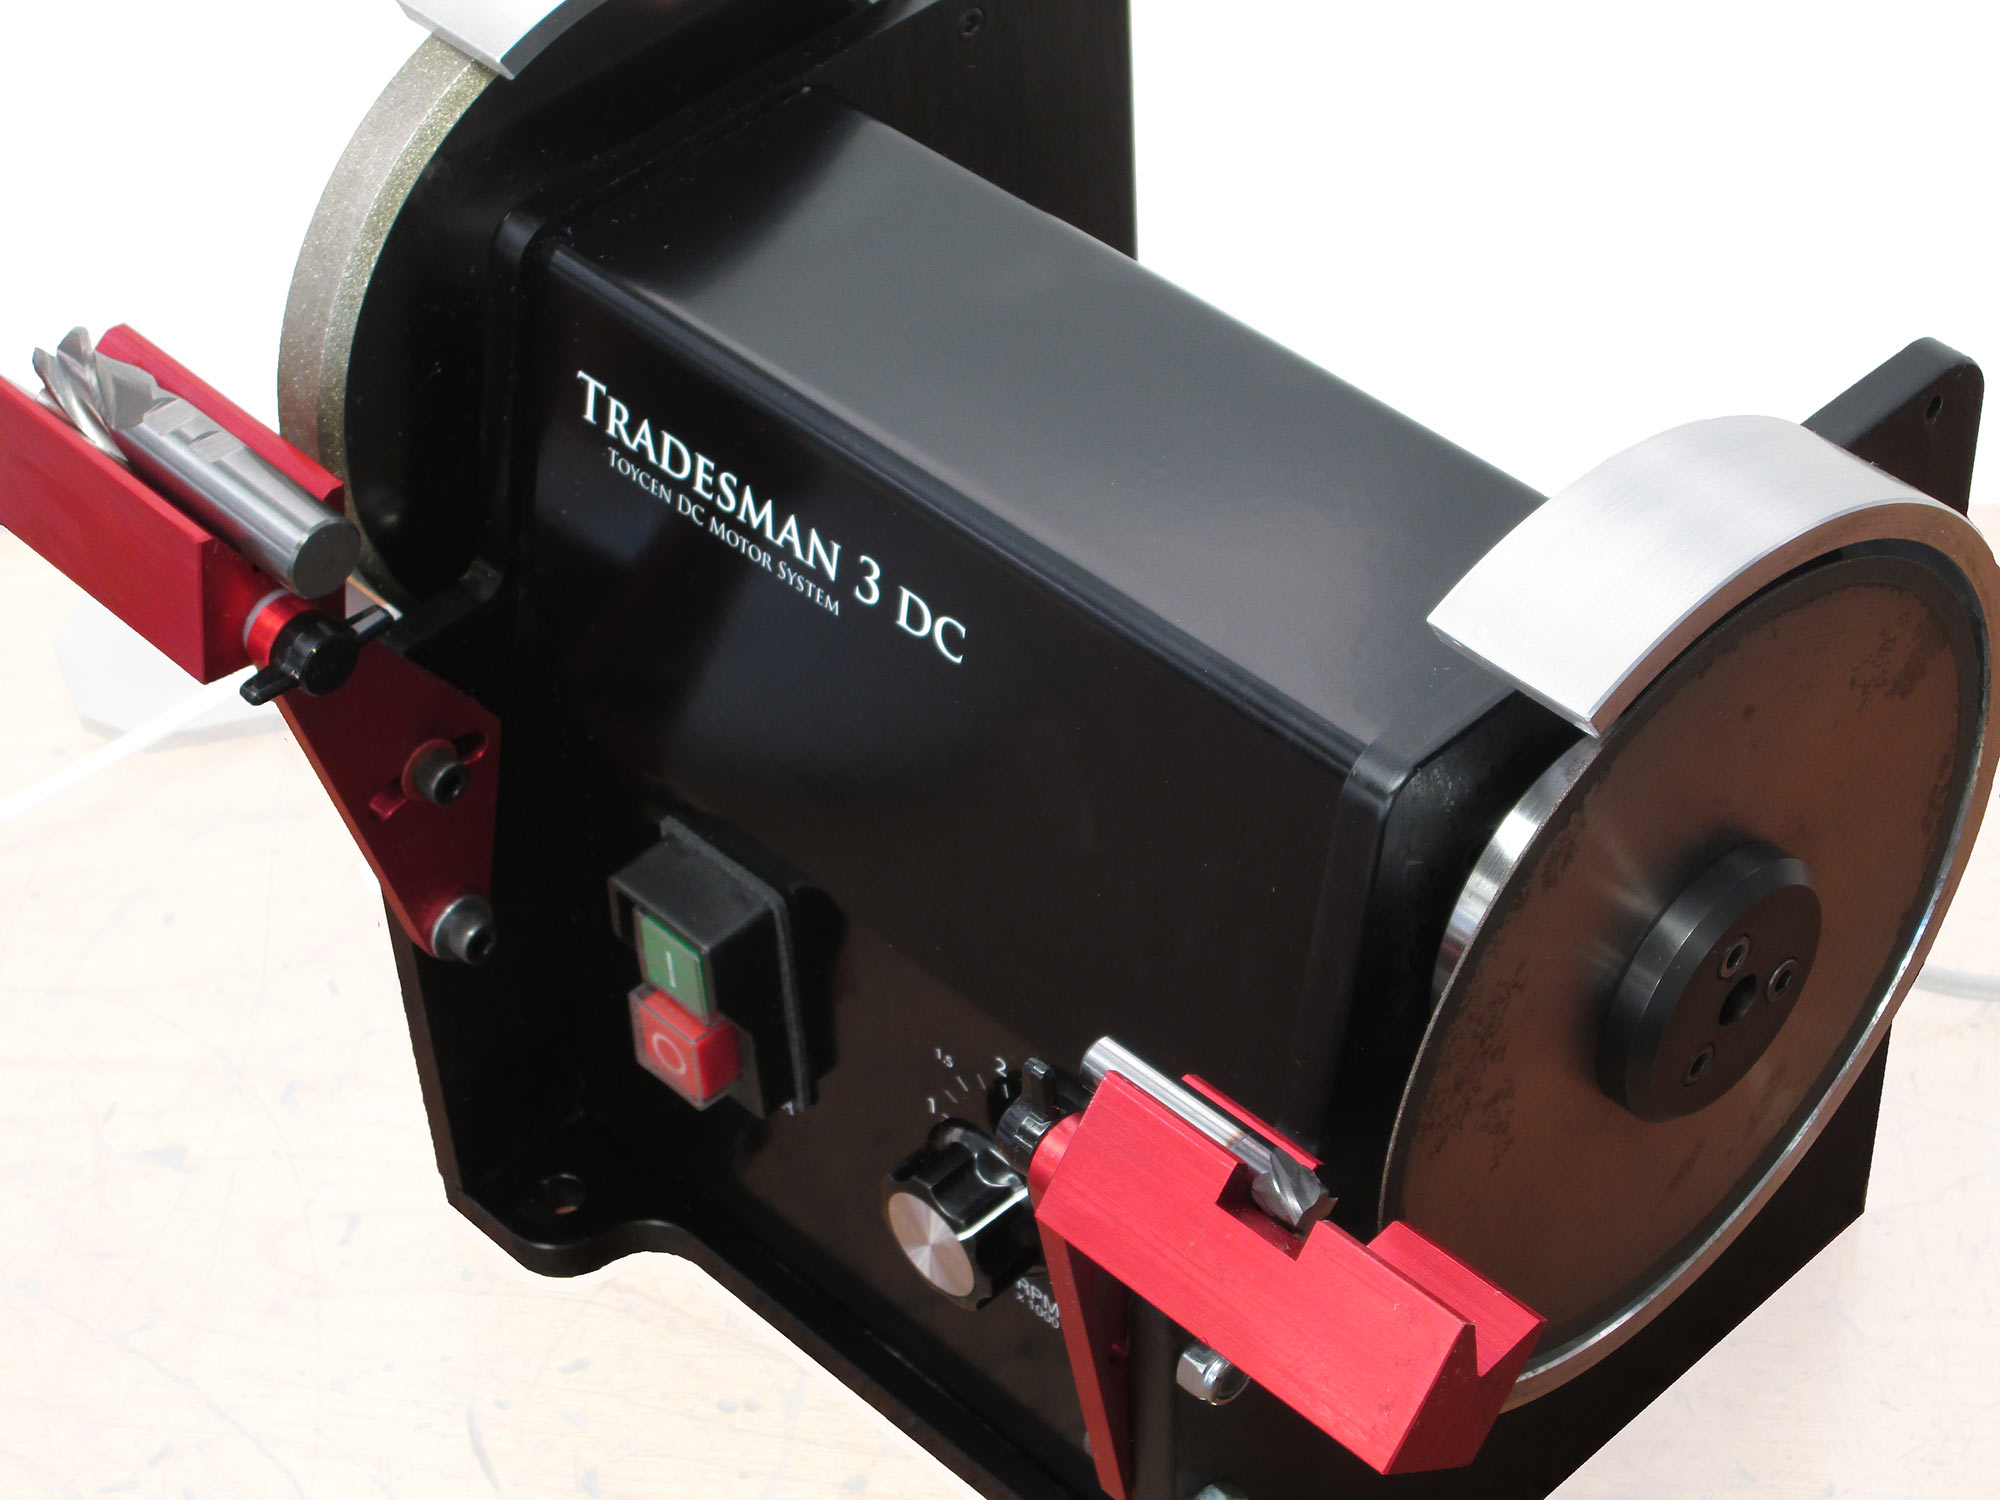 Tradesman Dc Variable Speed Reversing Bench Grinder